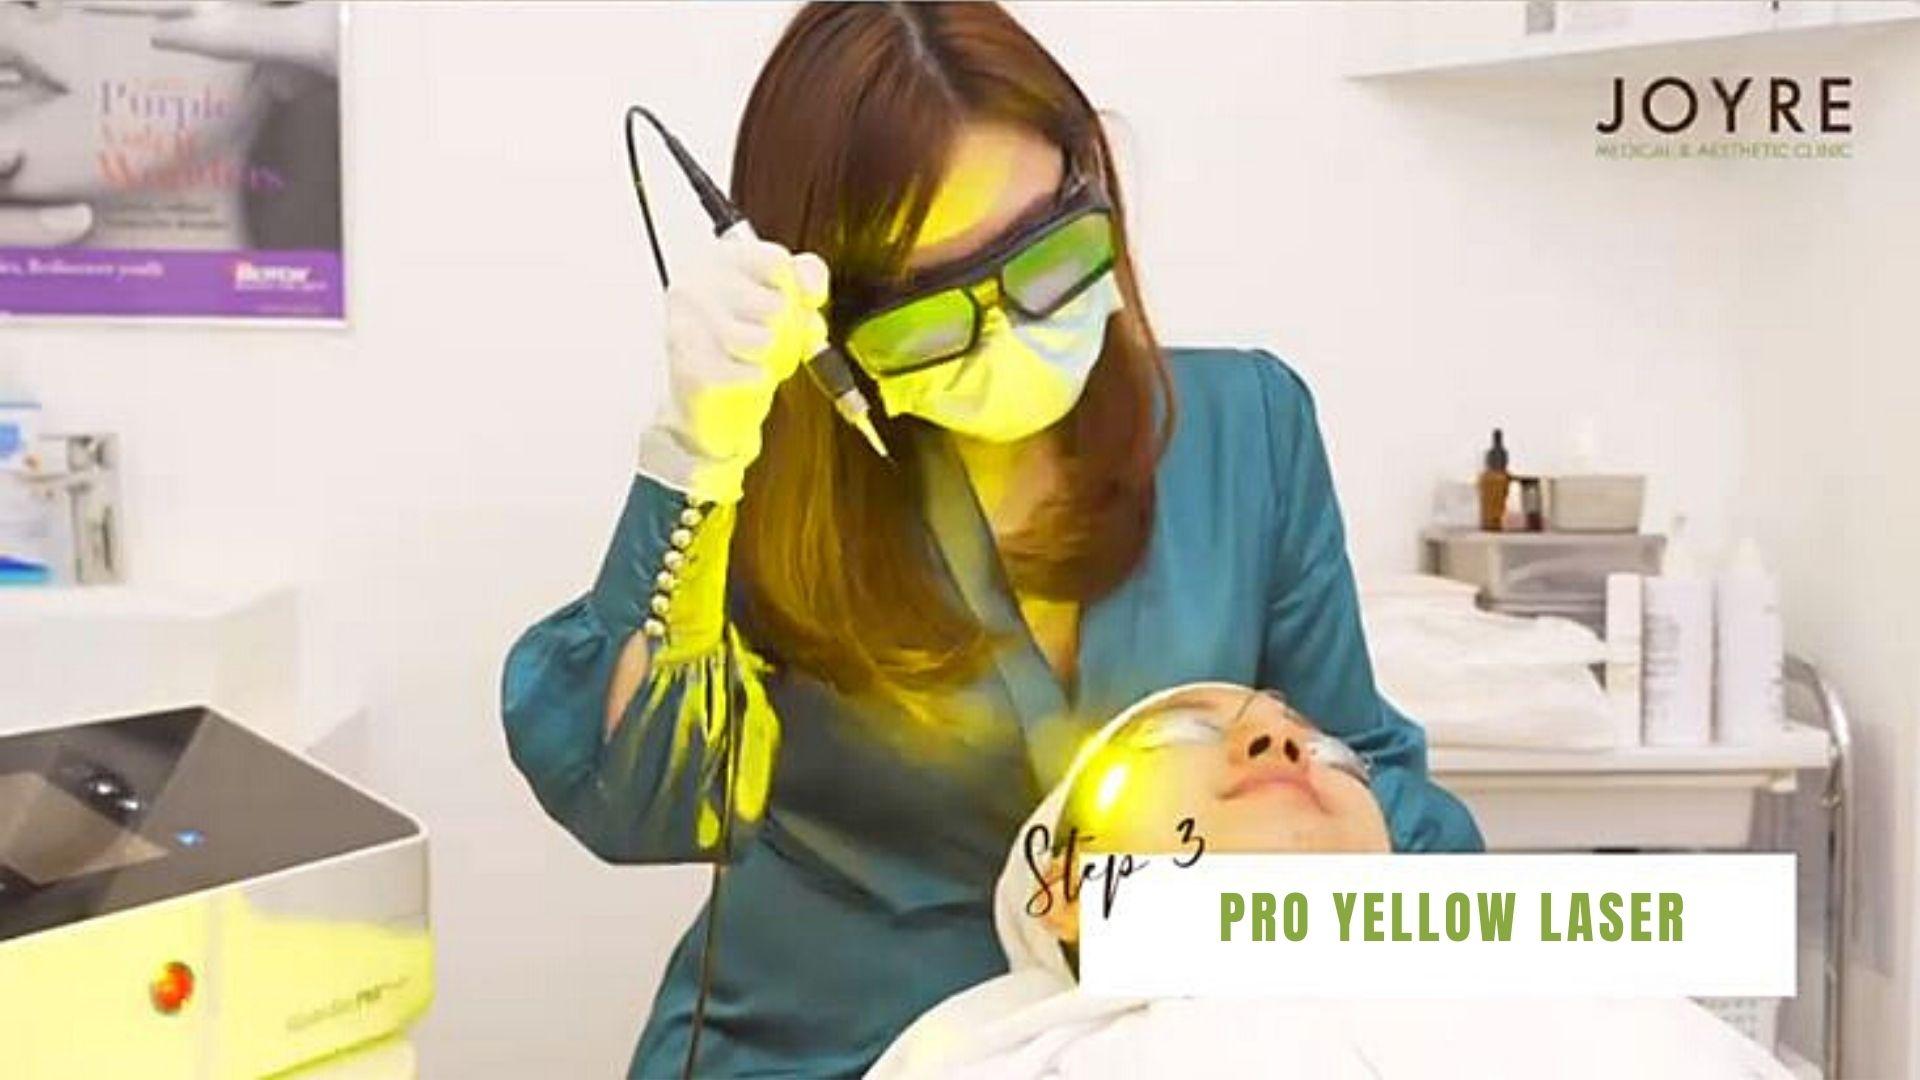 pro yellow laser singapore